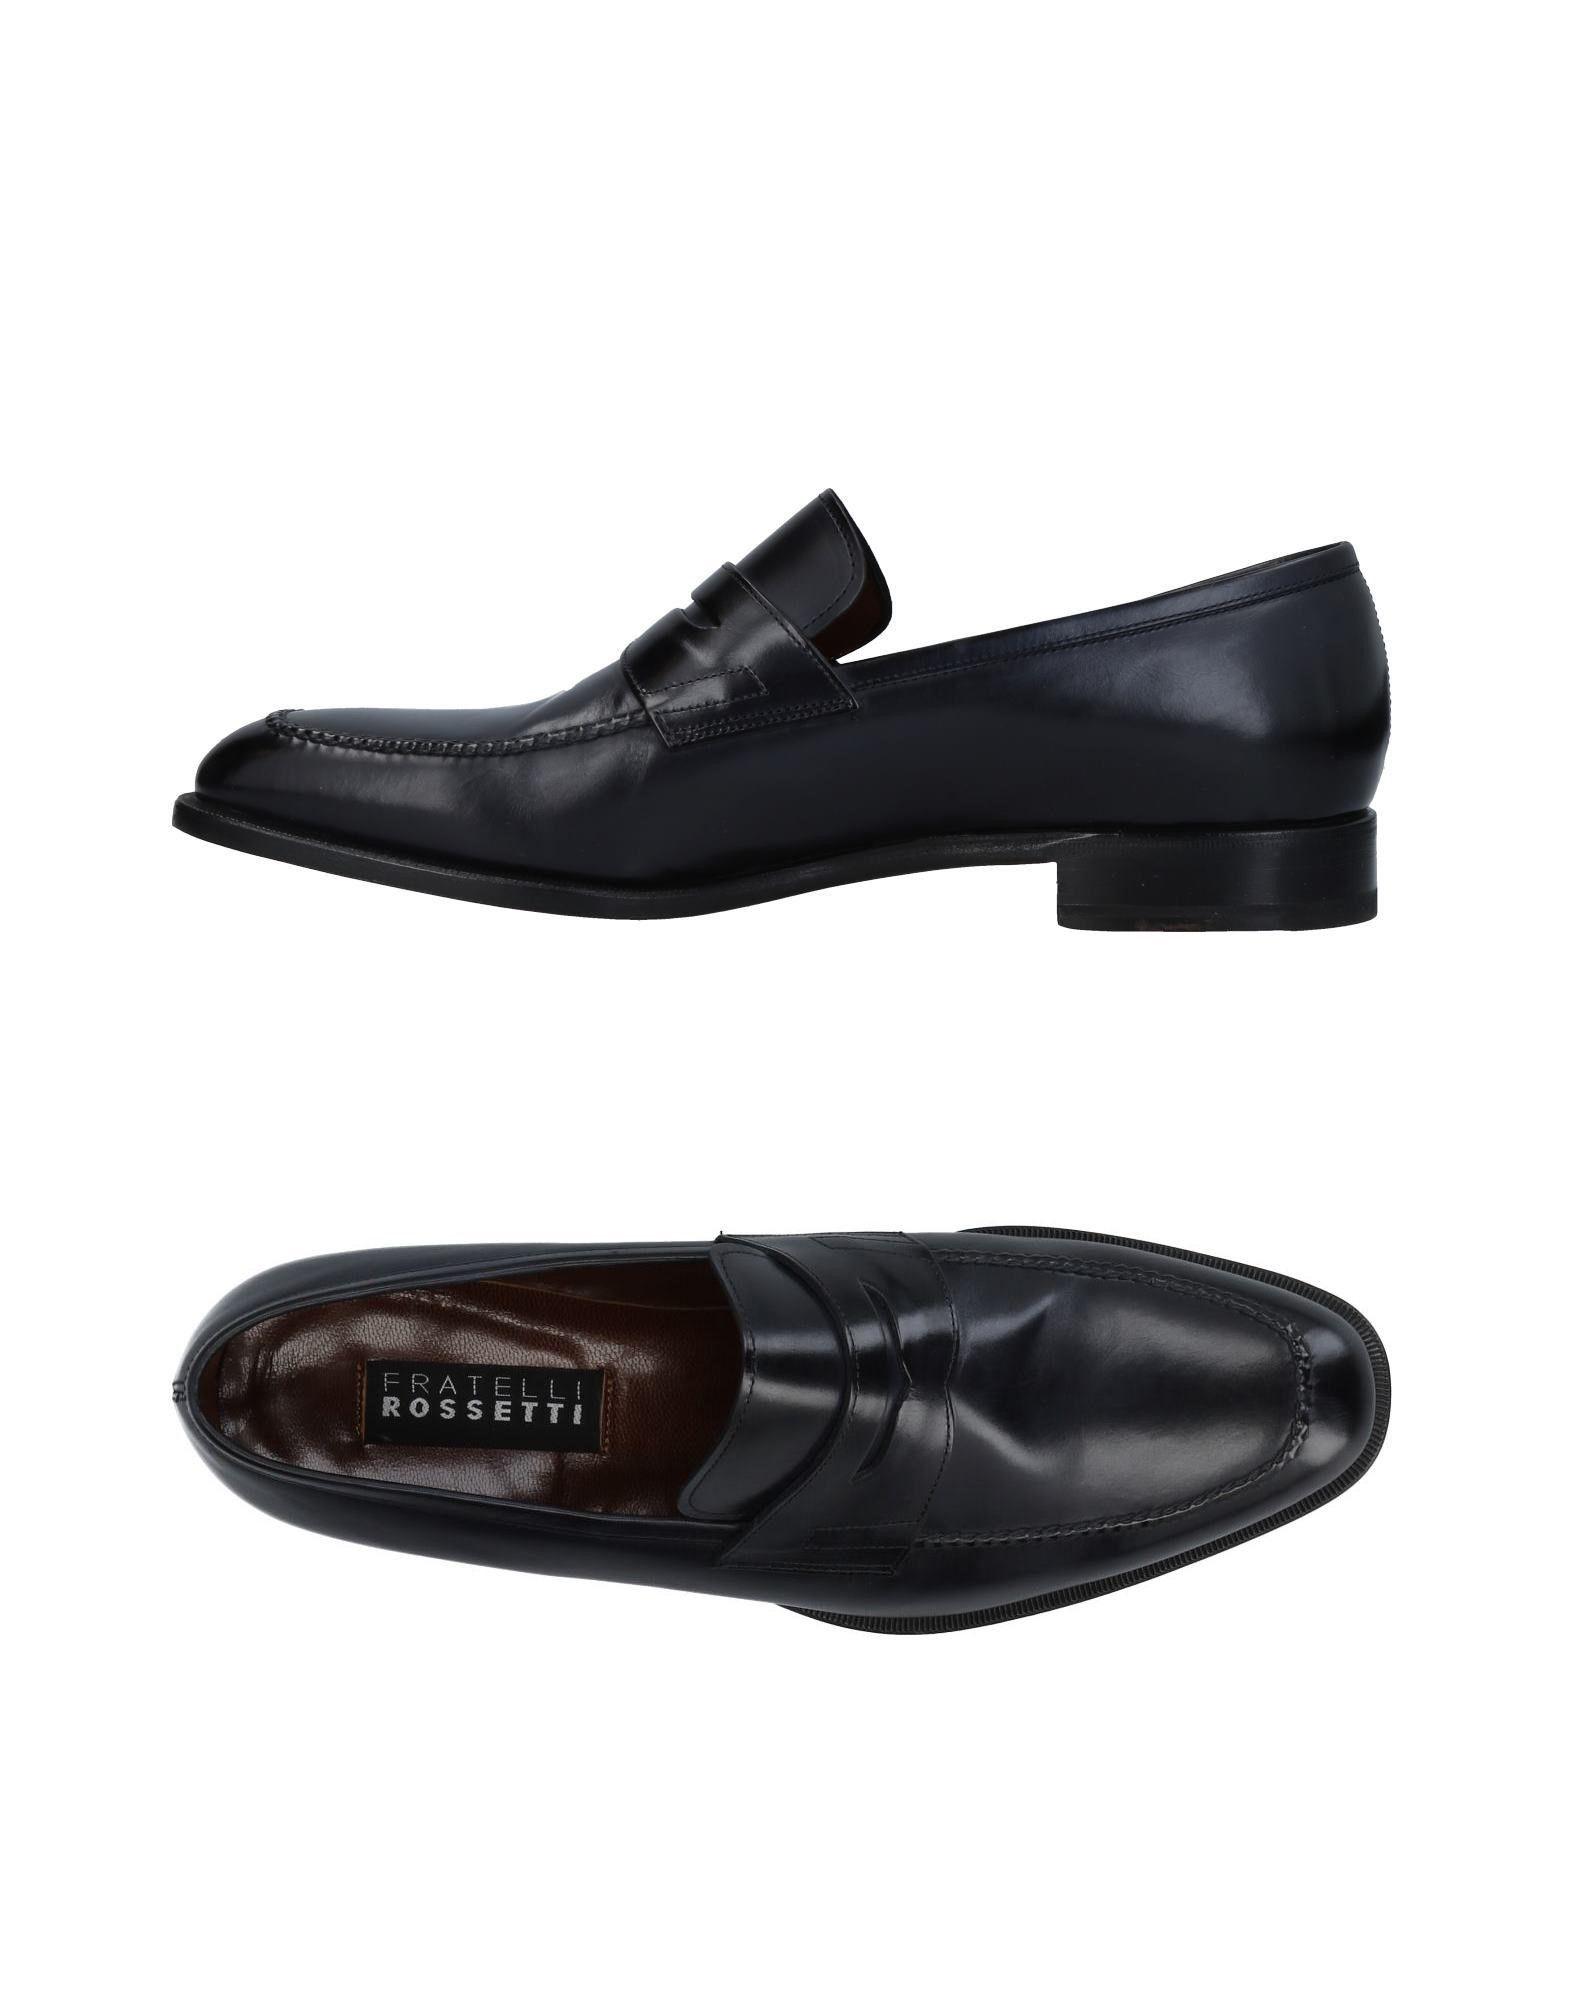 Fratelli Rossetti Mokassins Herren  11440610SH Gute Qualität beliebte Schuhe